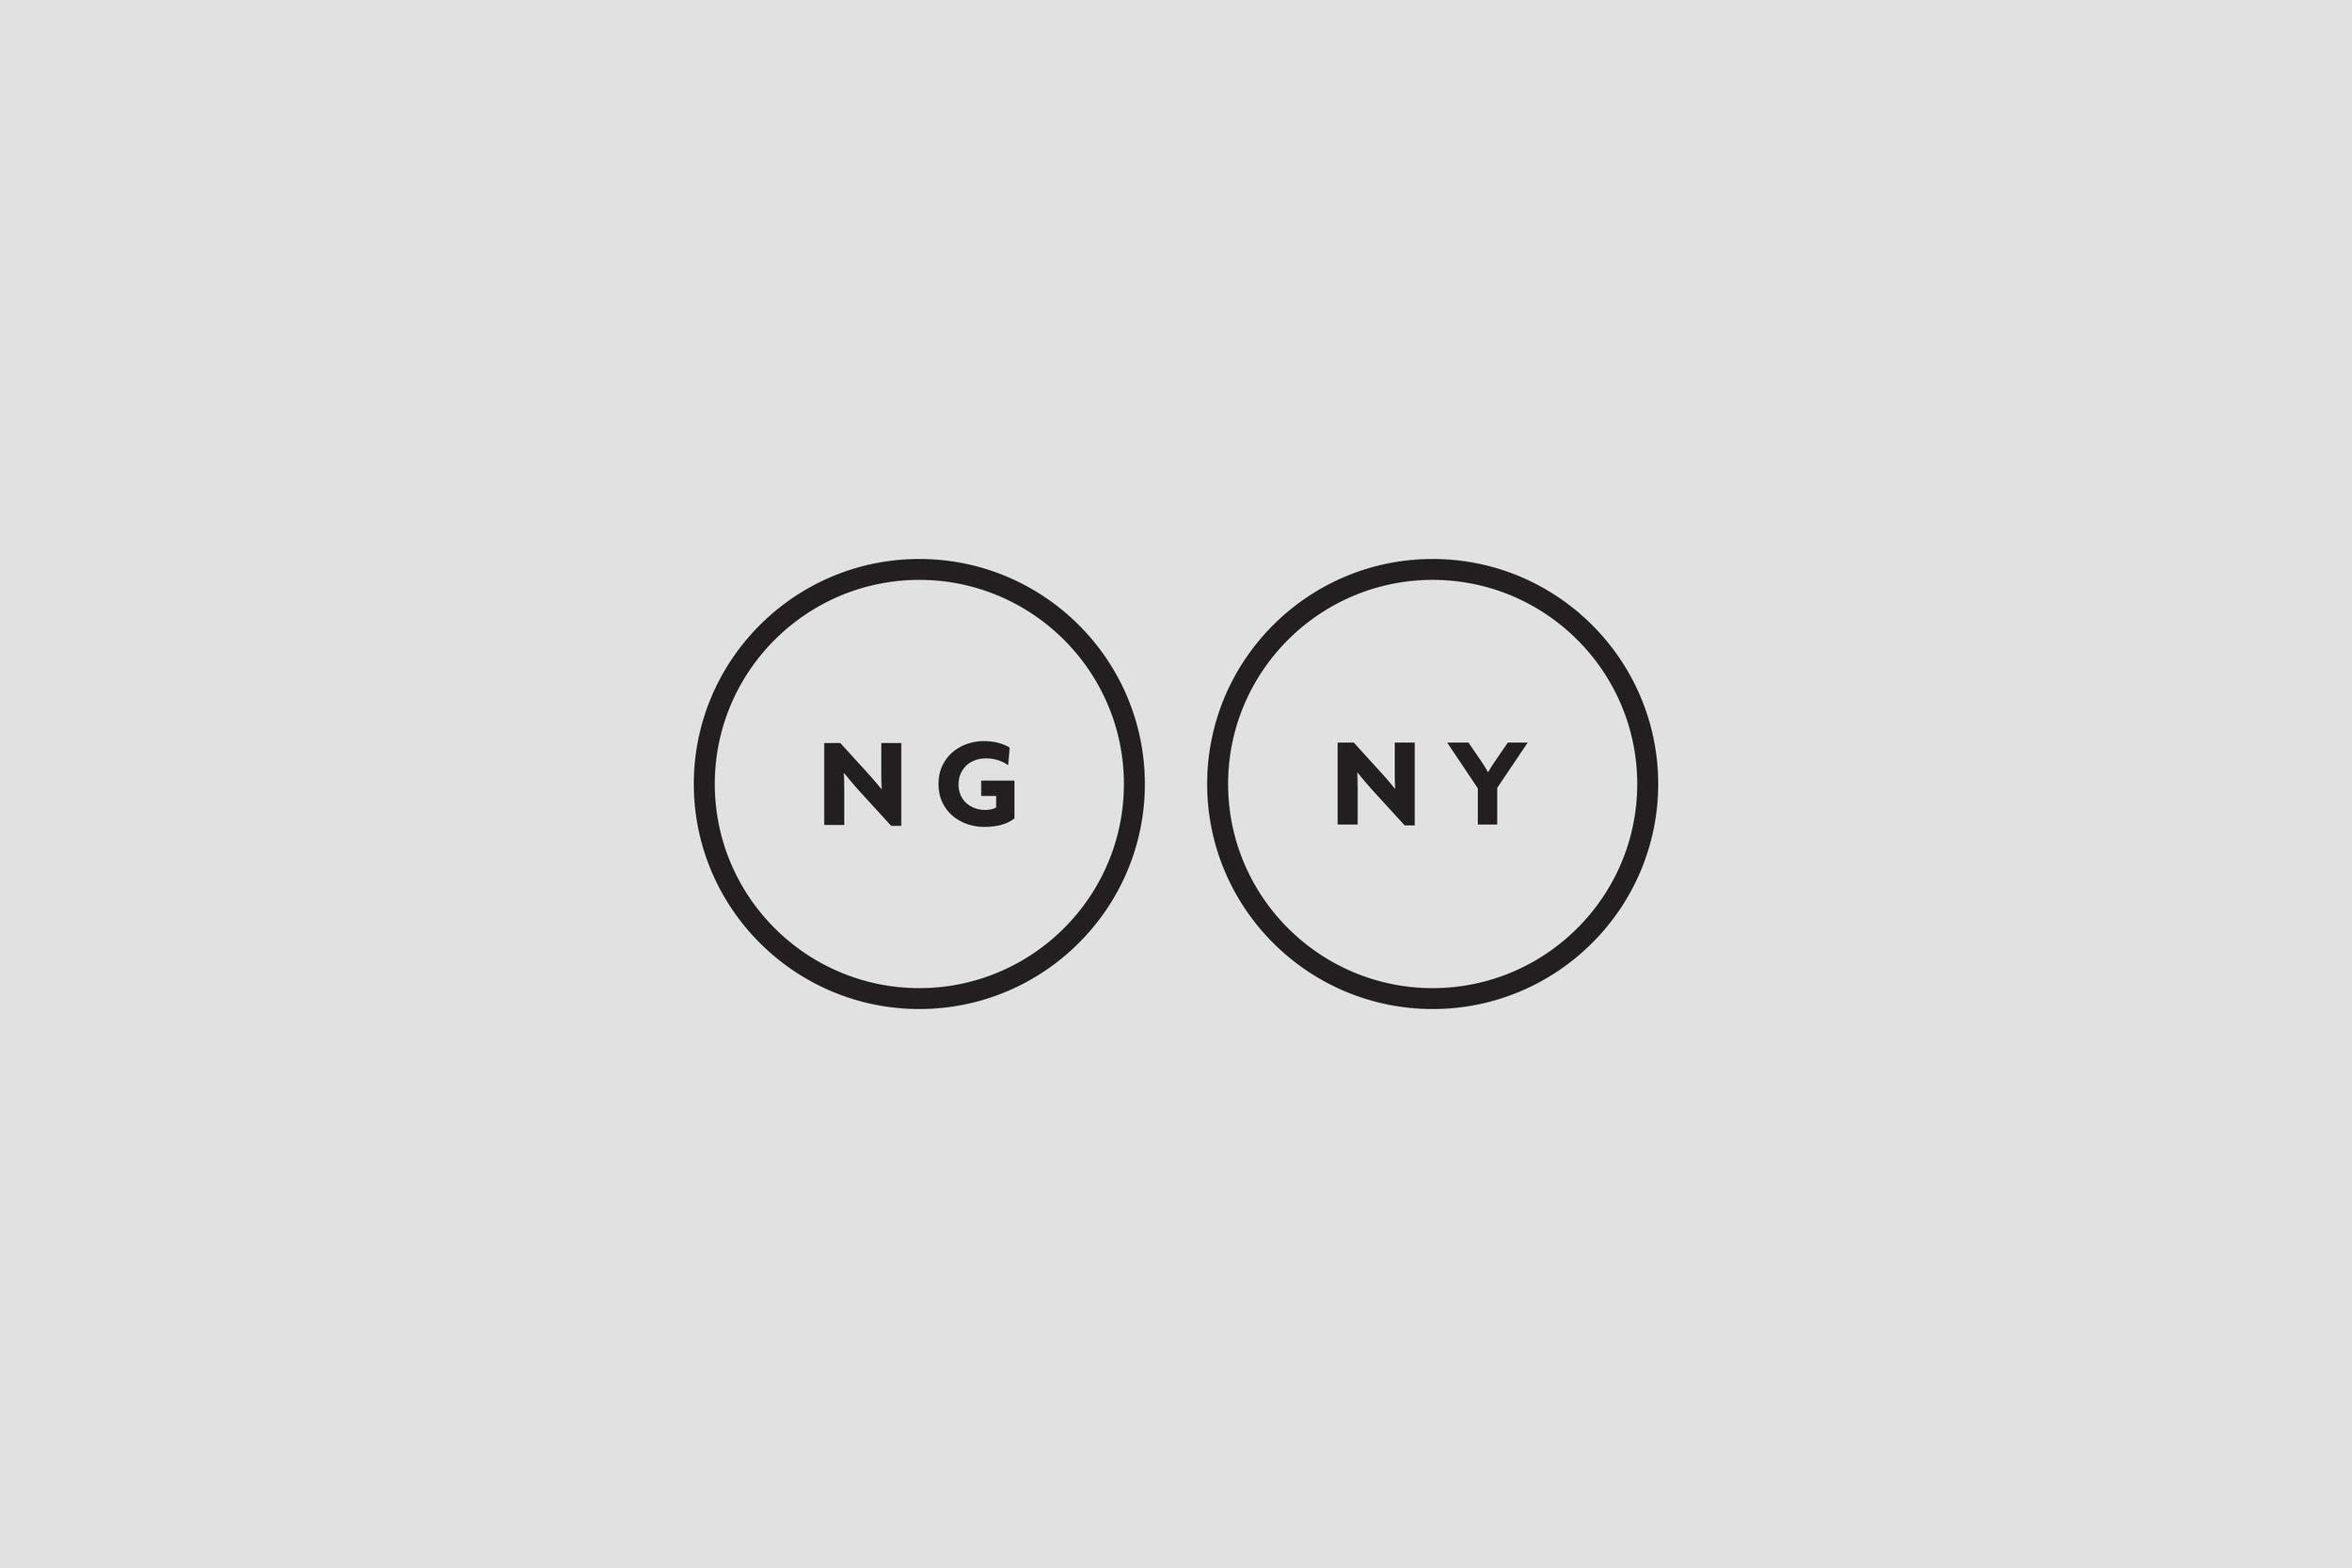 NGNY_Folio_logo.jpg